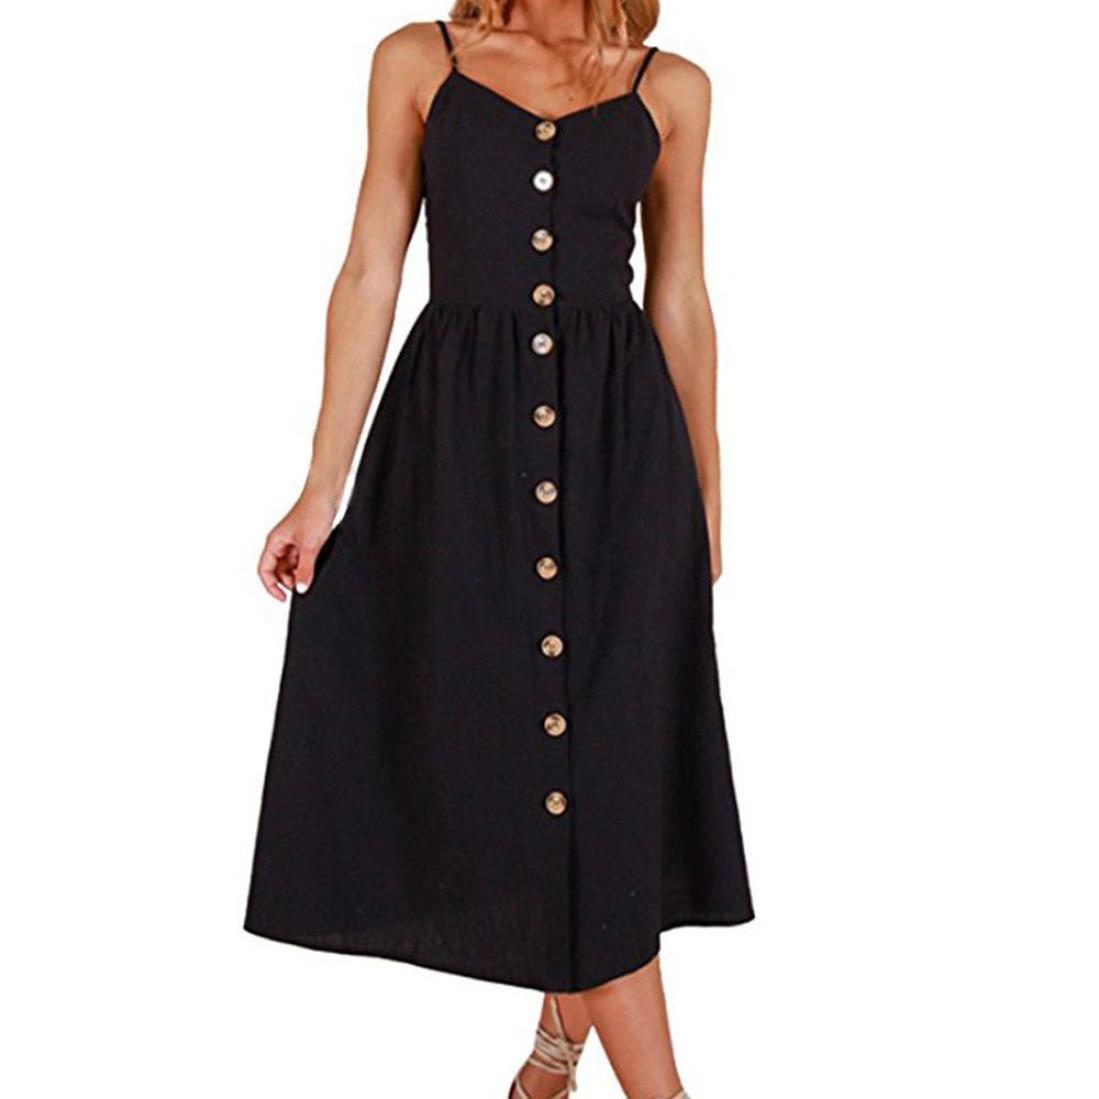 Women Long Dress Daoroka Ladies Sexy V Neck Strap Off Shoulder Vintage Flower Print Boho Casual Loose Beach Skirt (L, Black2)